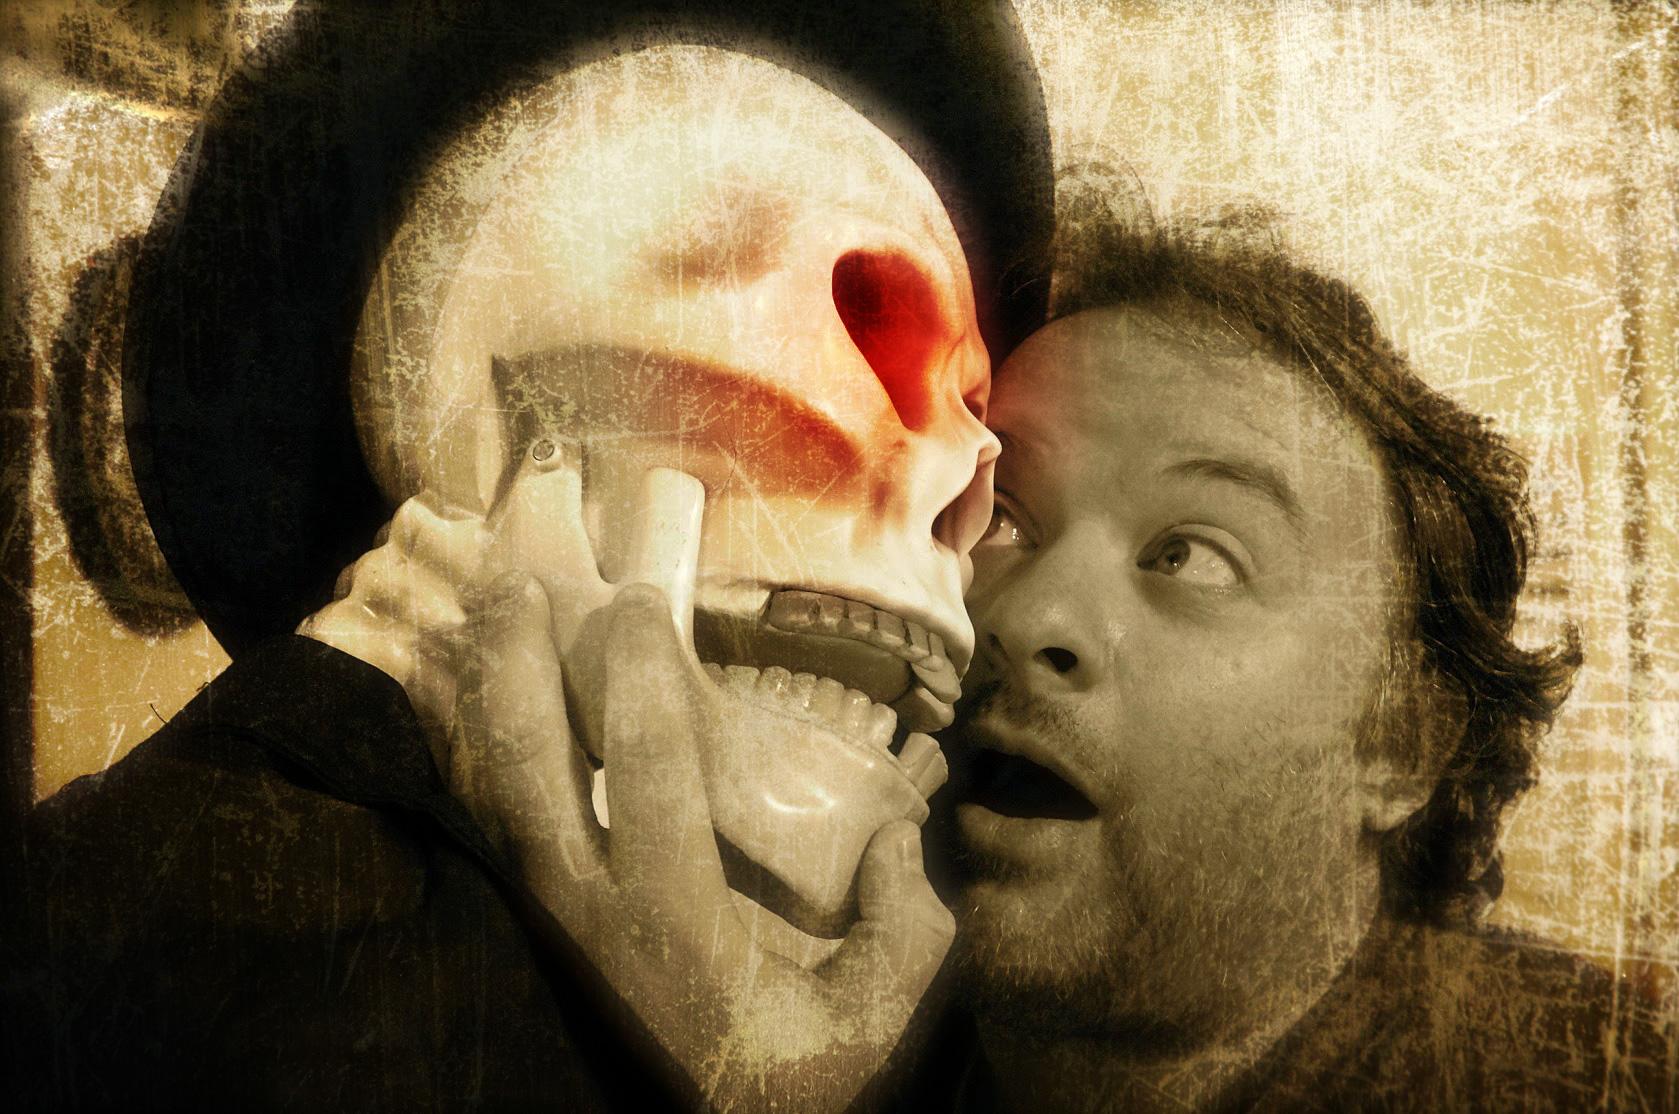 God of War creator David Jaffe says he wants to make a VR horror game